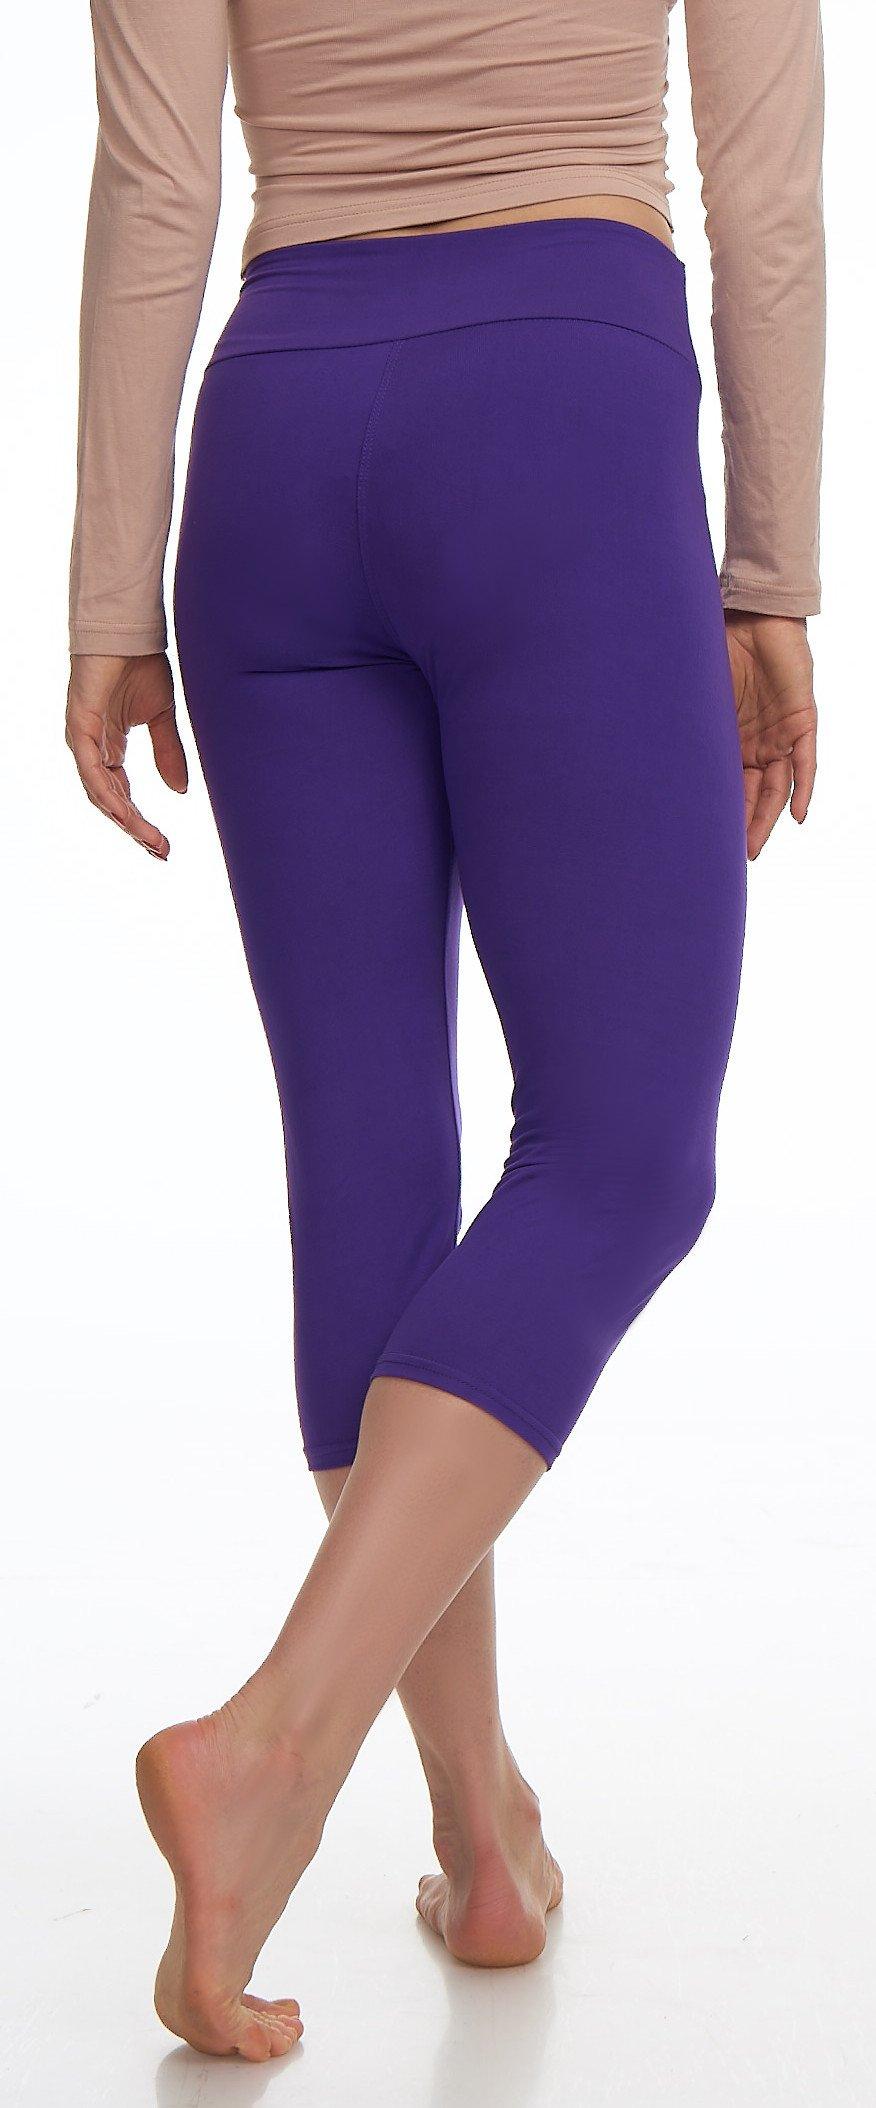 Lush Moda Extra Soft Leggings Variety of ColorsPlus Size Yoga Waist Purple, One Size fits Most (XL 3XL), Purple Yoga Waist by LMB (Image #5)